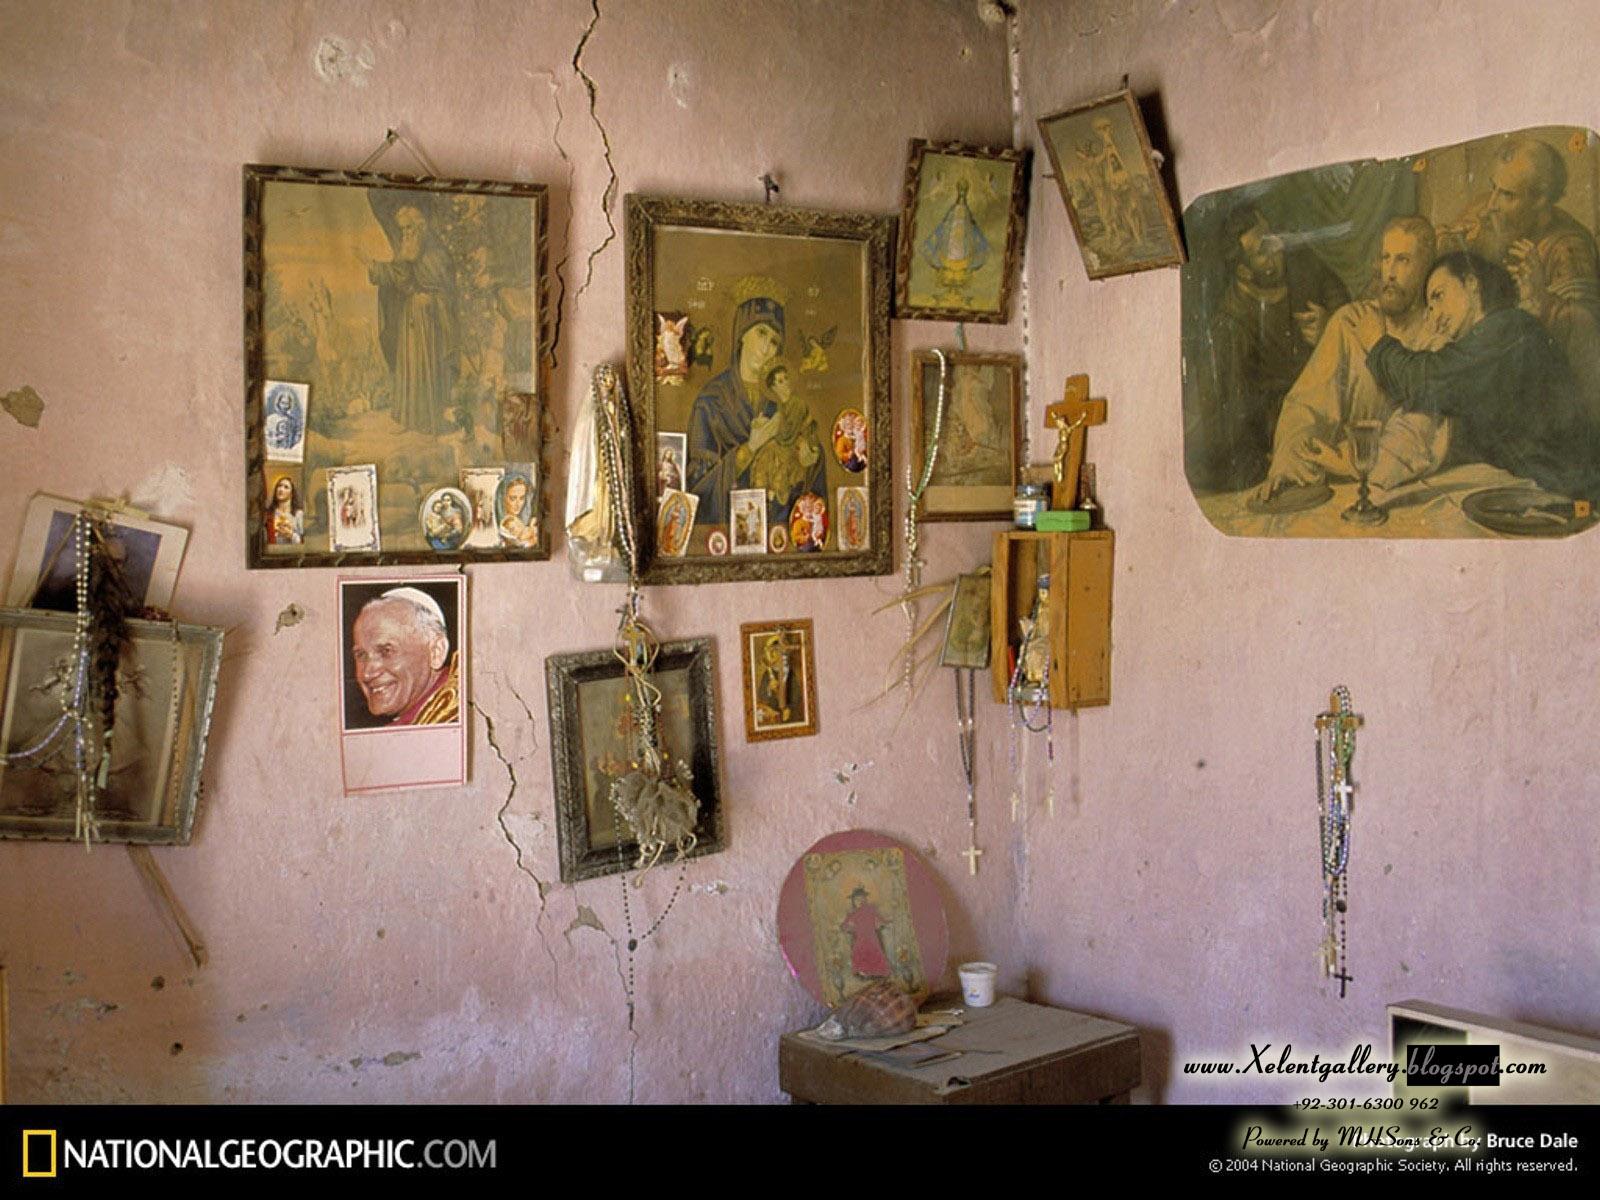 http://4.bp.blogspot.com/-HlZdE6UEsig/T9rOqUFO24I/AAAAAAAABYo/ofBsPayNpEA/s1600/National+Geographic+Wallpapers+%25284%2529.JPG